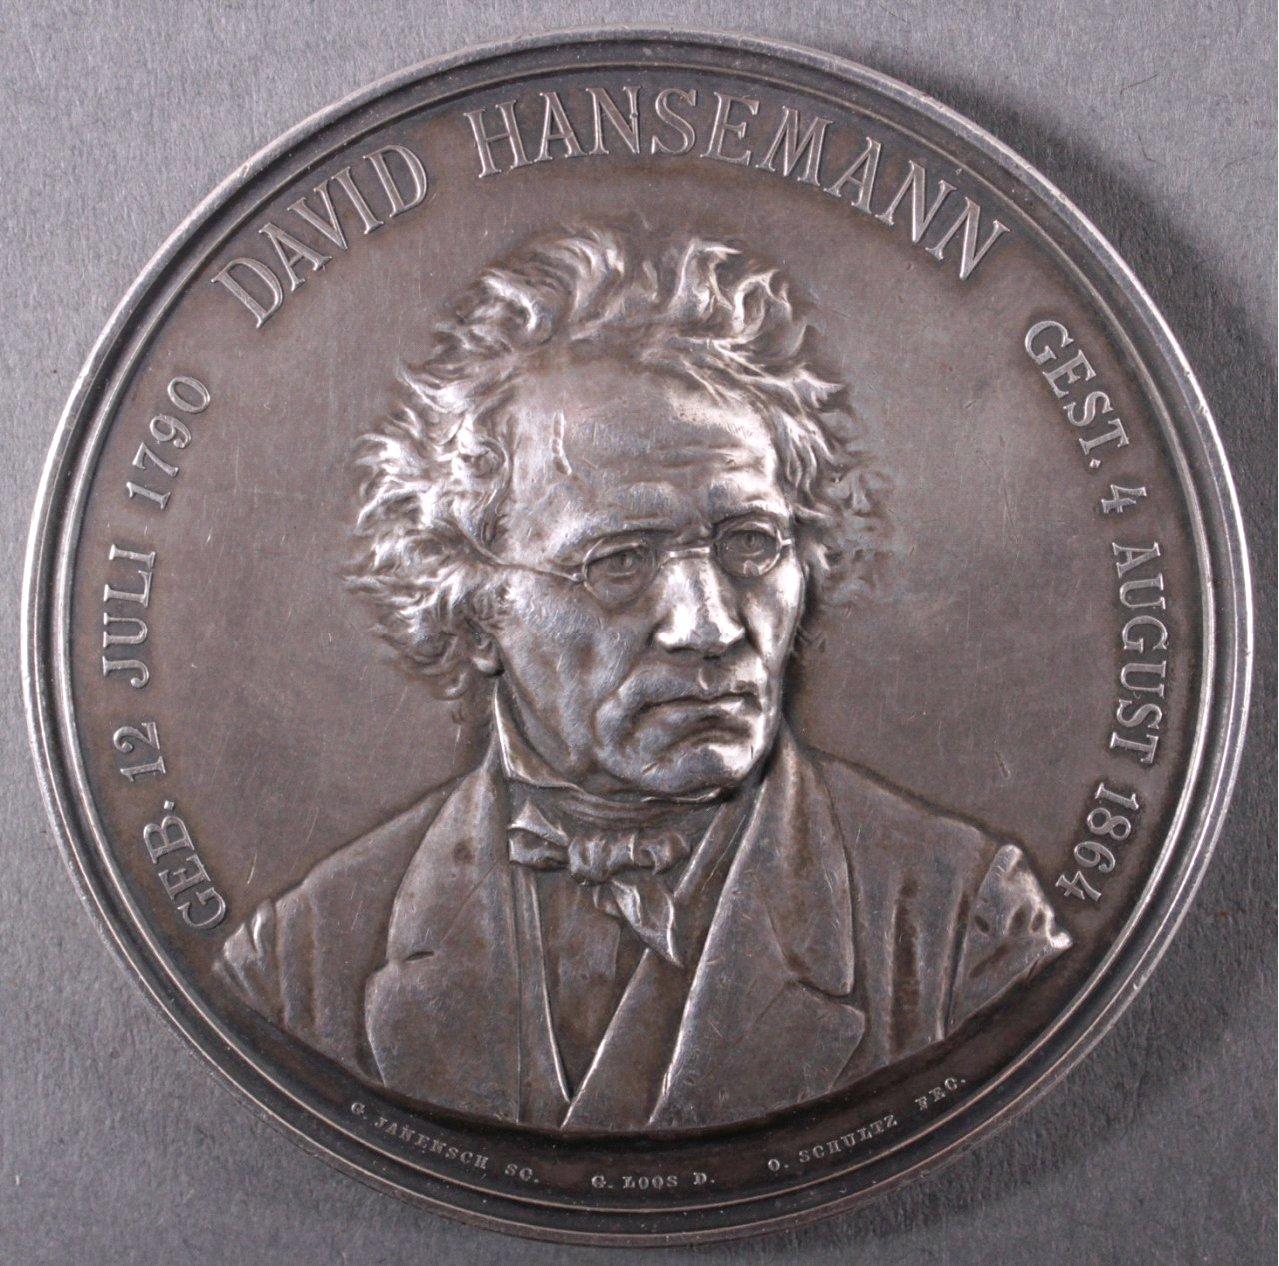 Silber Medaille  David Hansemann, 1864, signiert